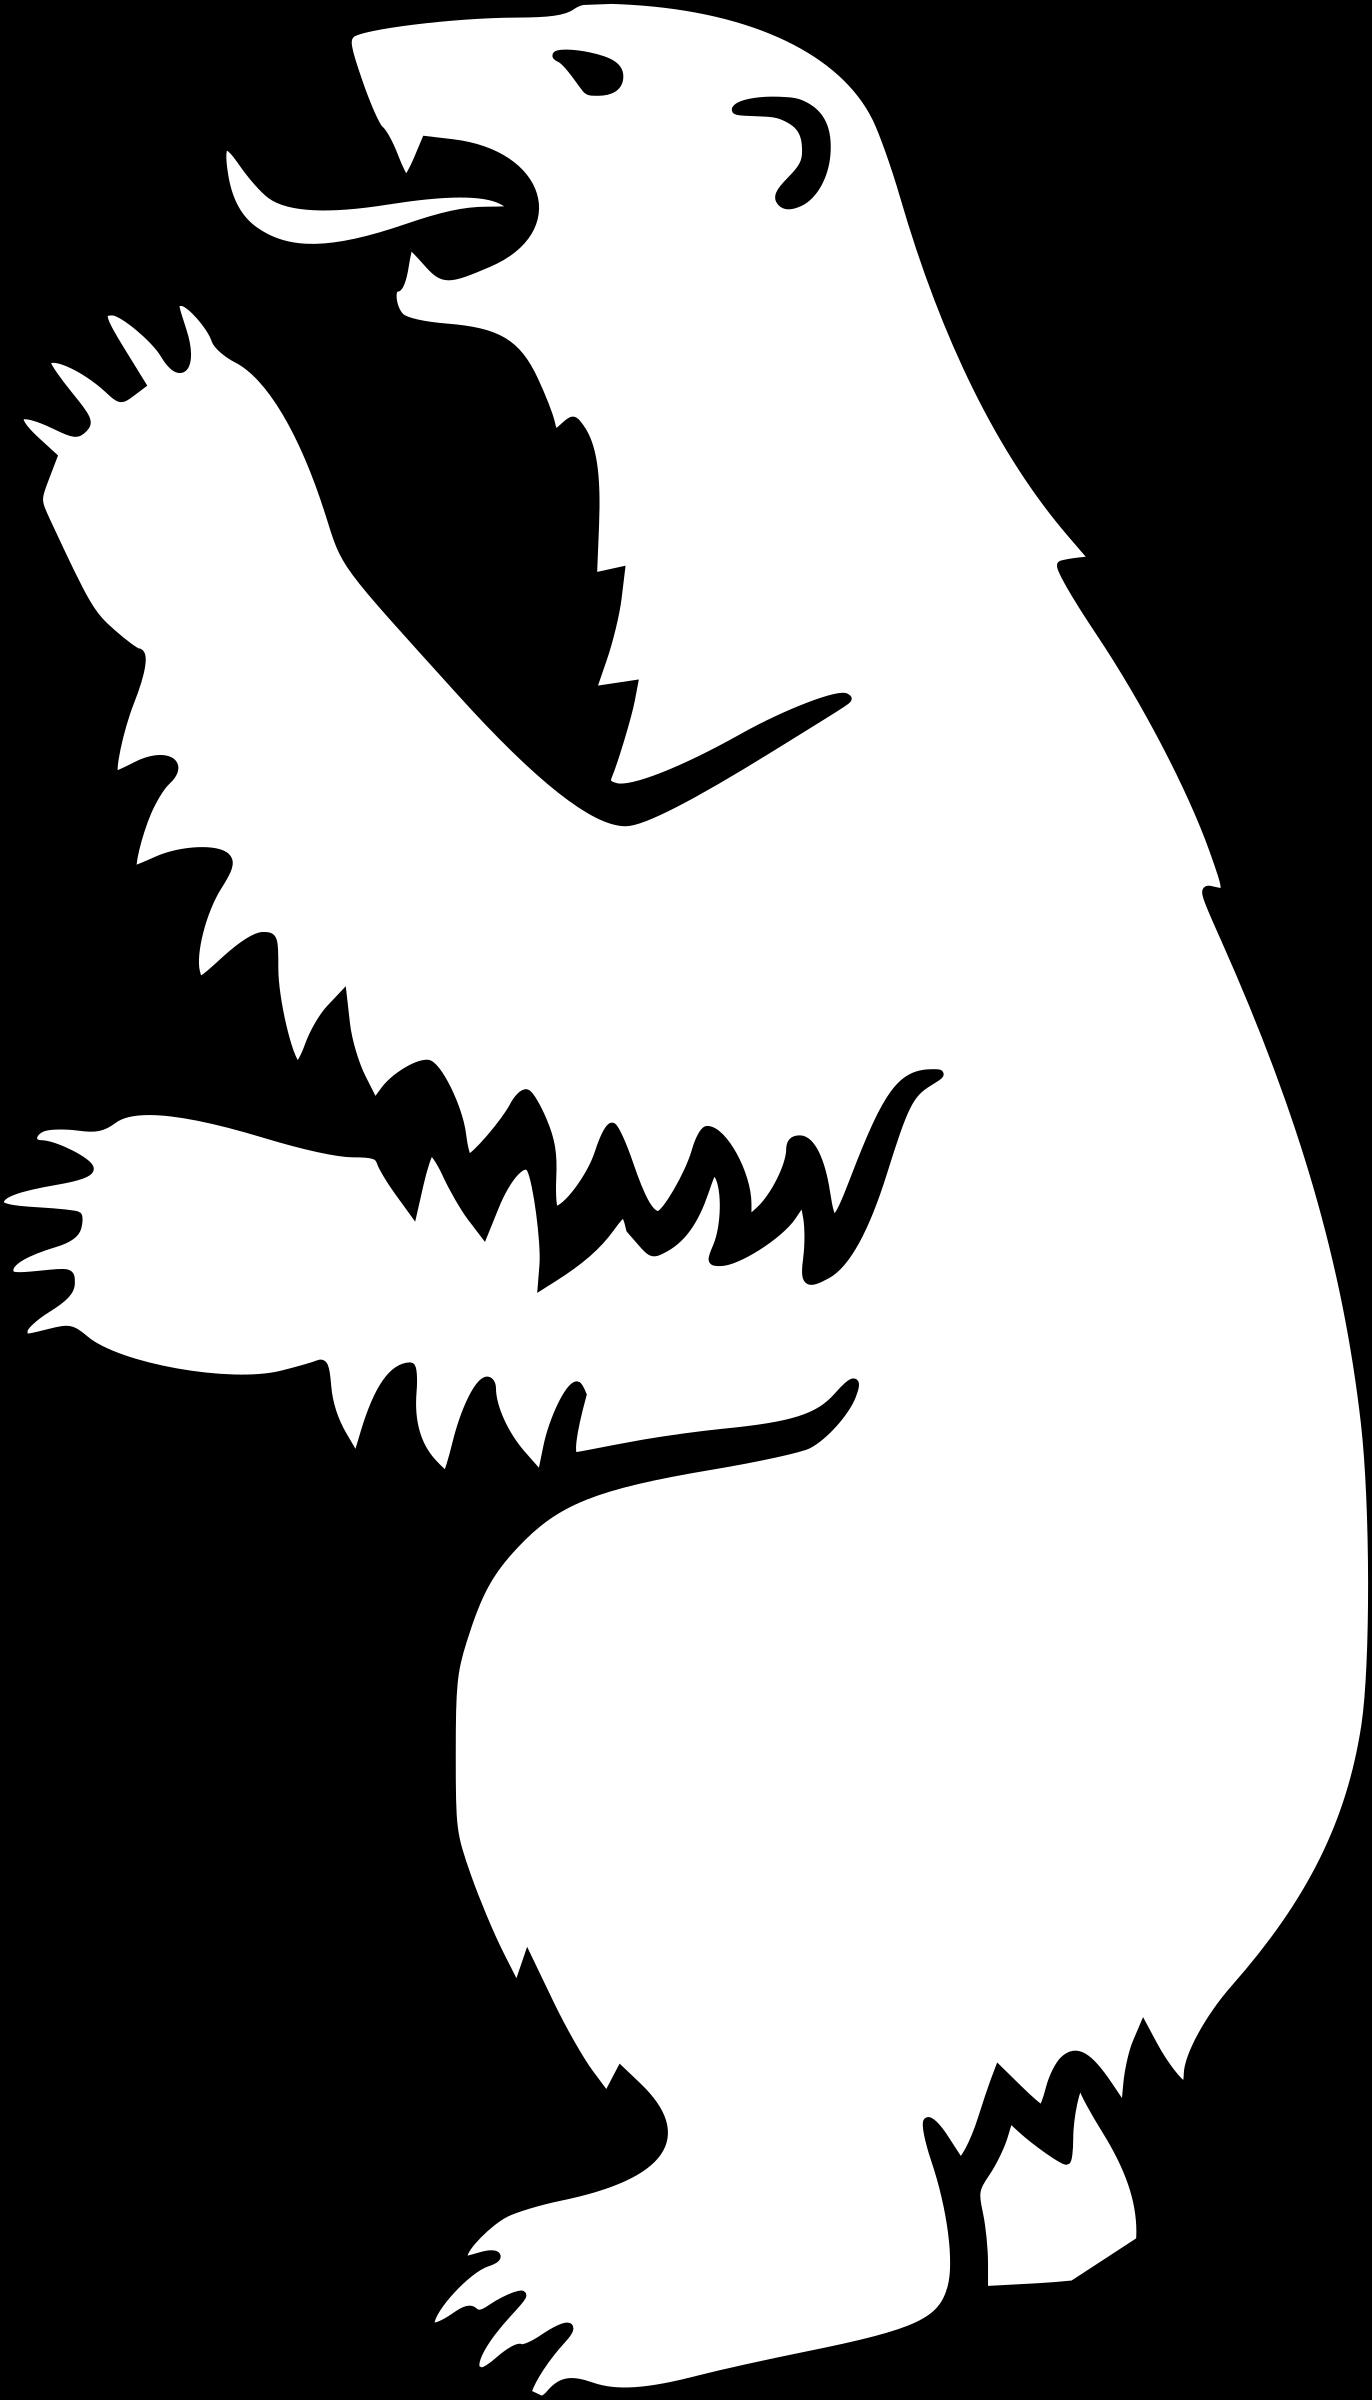 Coat of arms silhouette. Families clipart polar bear